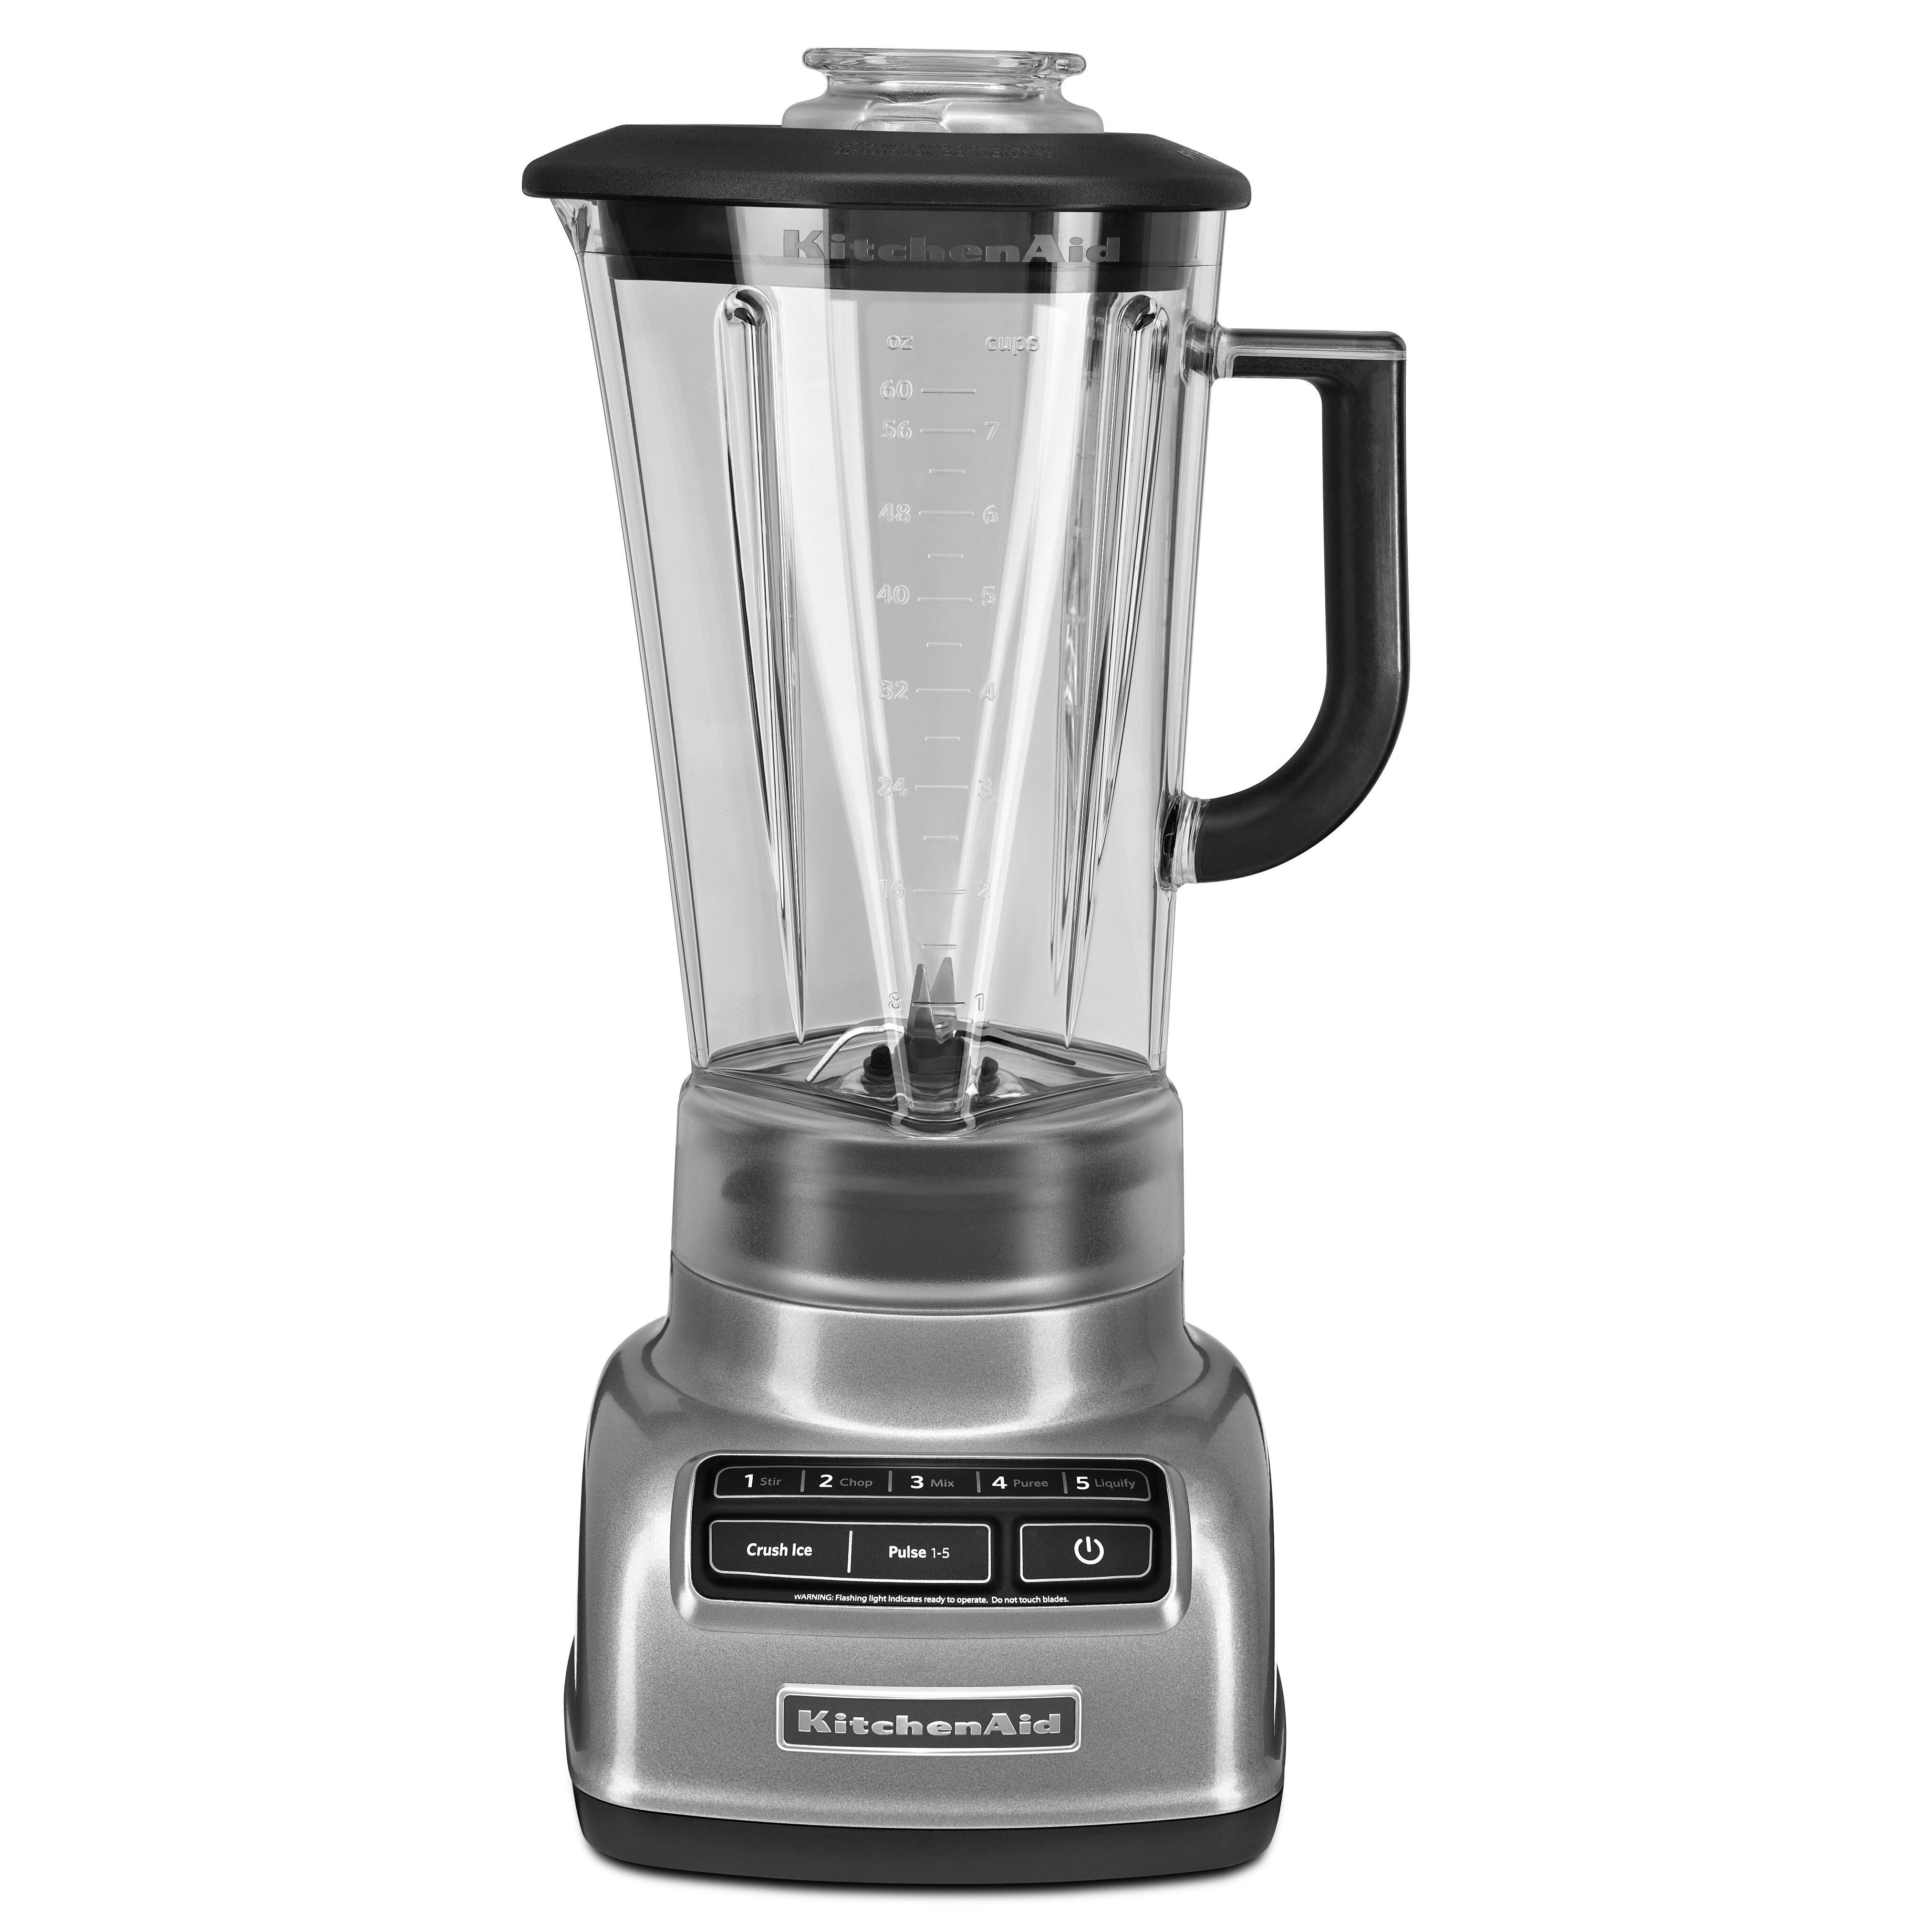 Cuisinart smartpower duet blender and food processor - Kitchenaid Diamond 5 Speed Blender